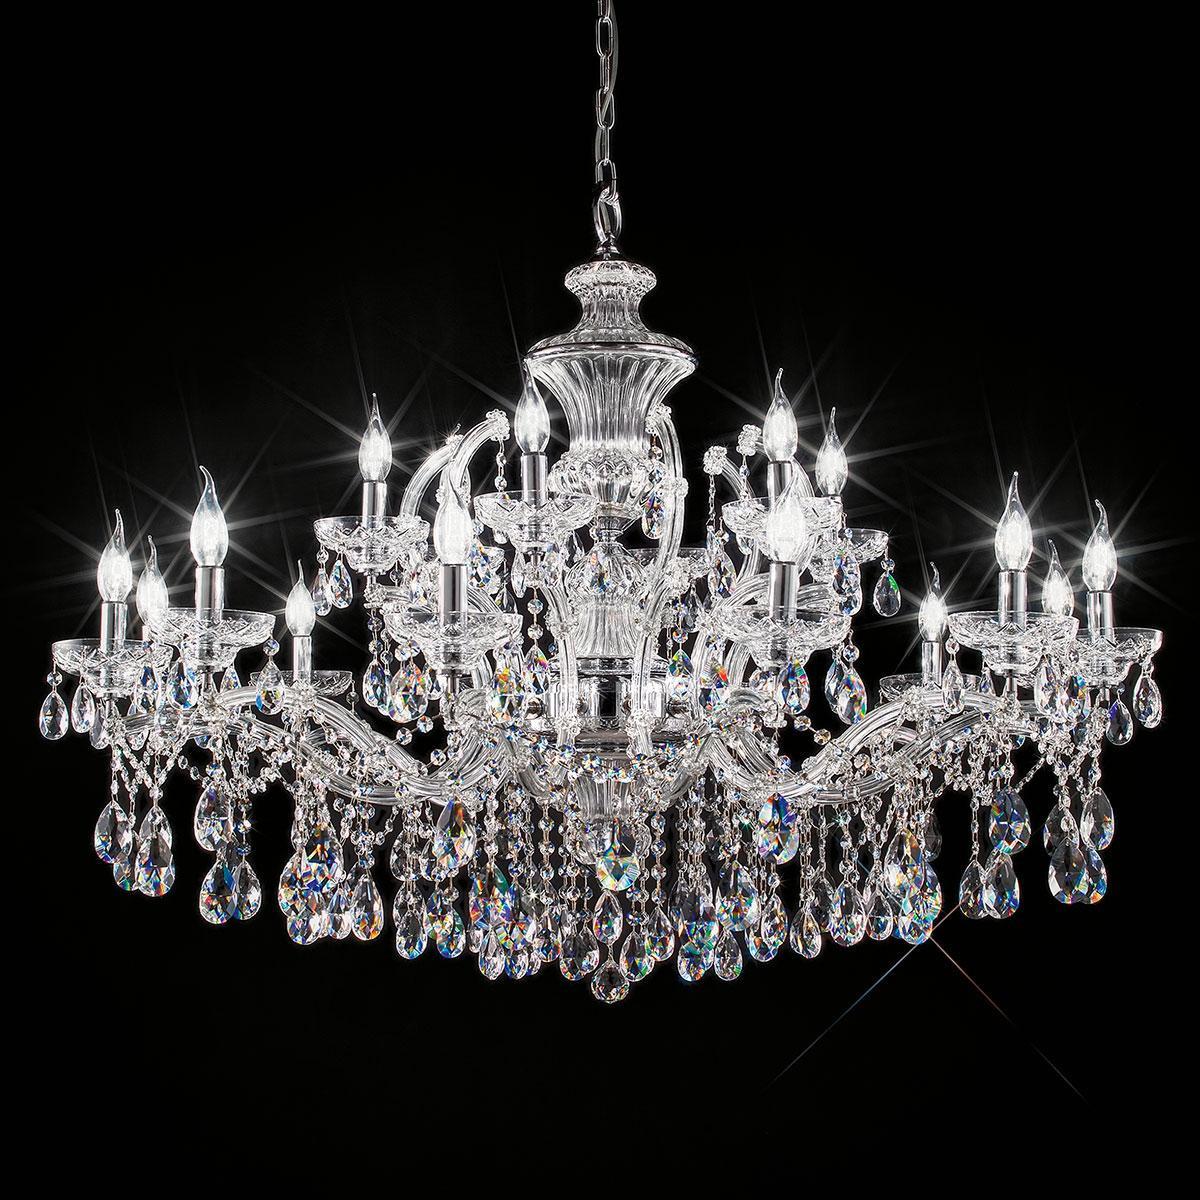 """Boccioni"" venezianischer kristall kronleuchter - 12+6 flammig - transparent mit kristal Asfour"